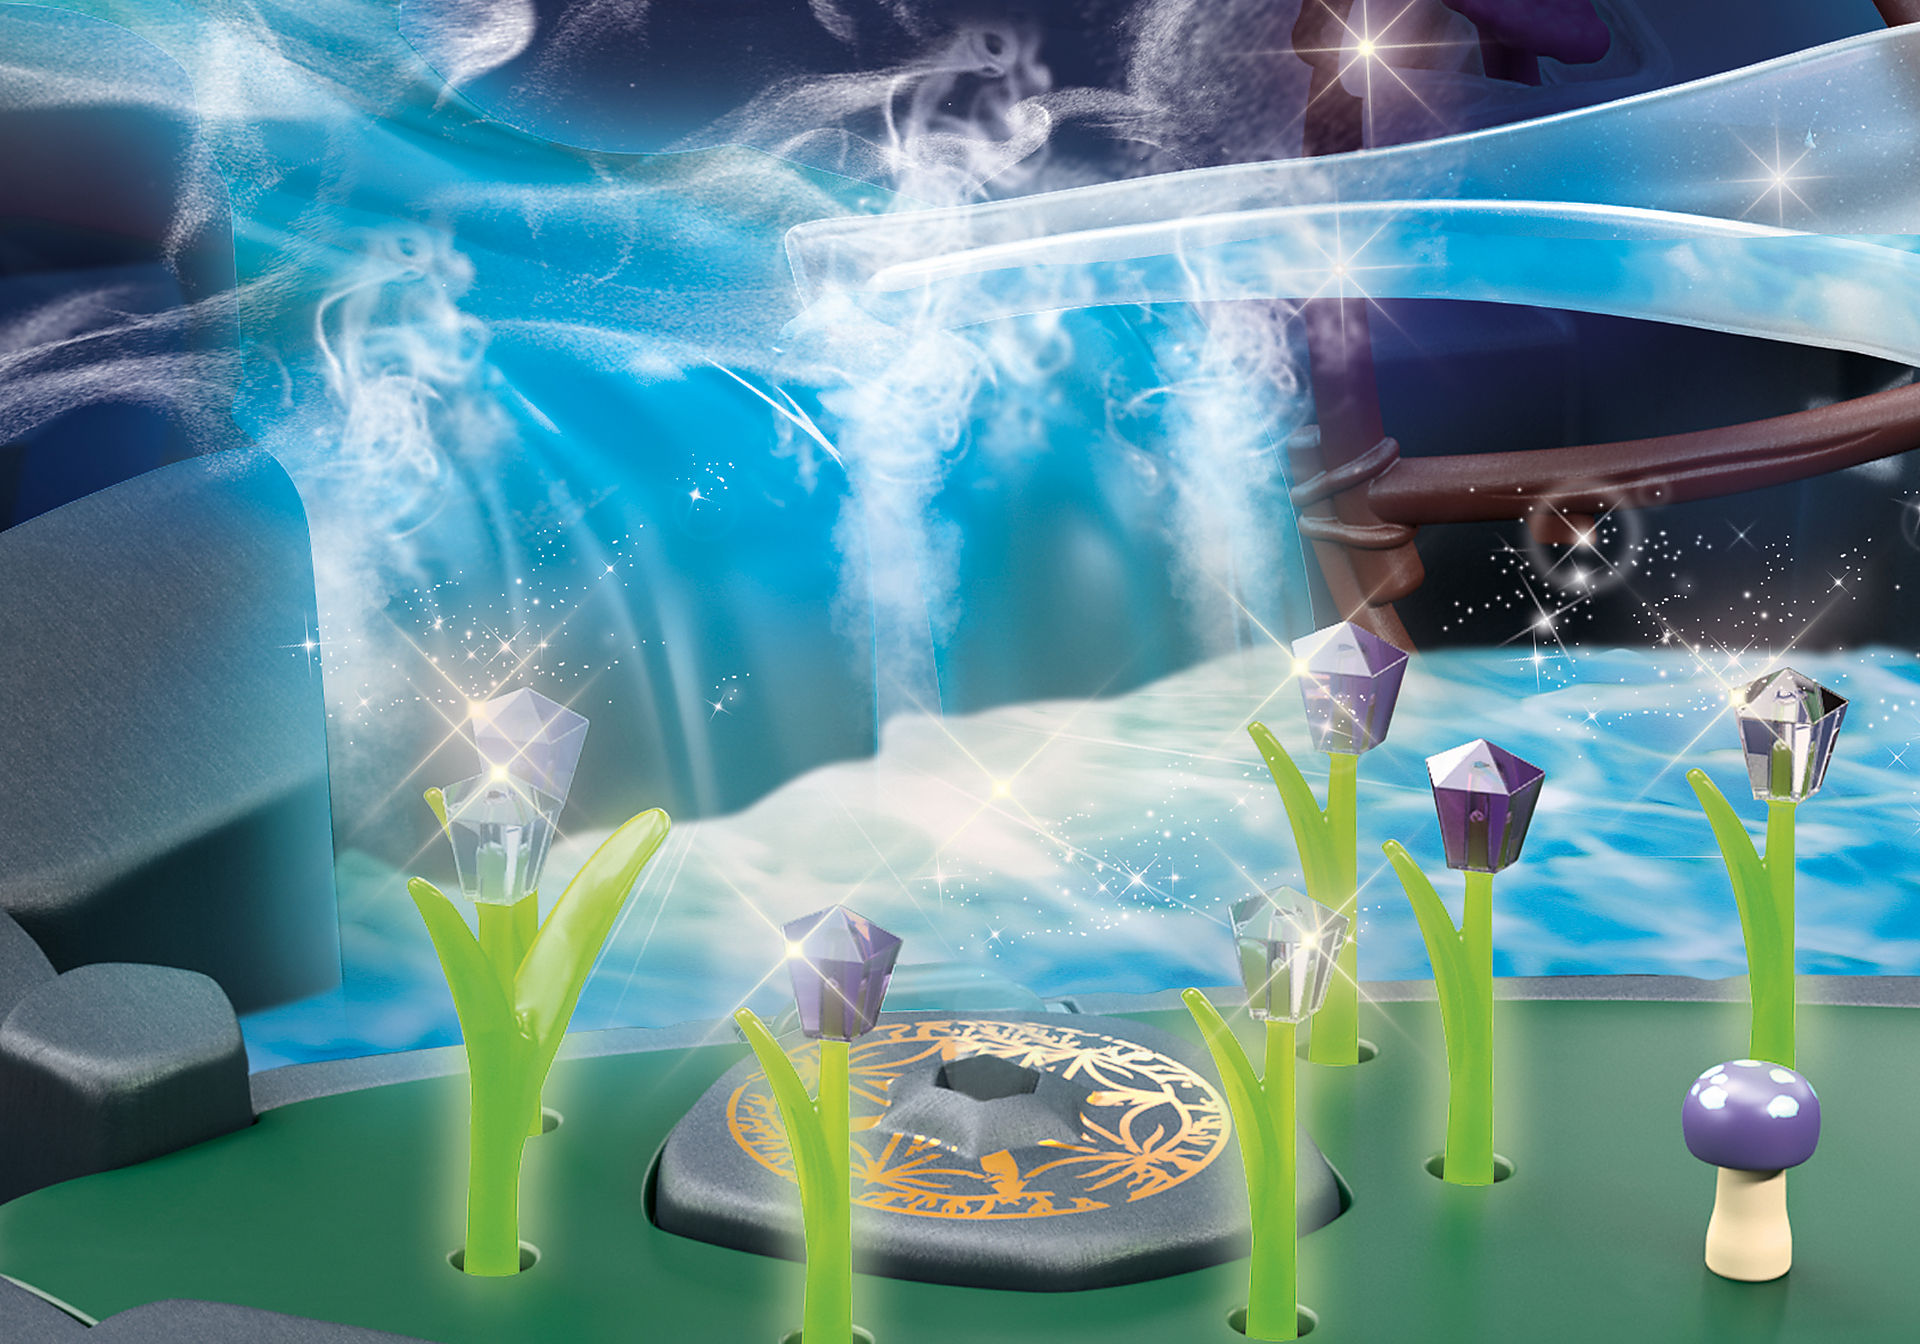 70800 Magical Energy Source zoom image7